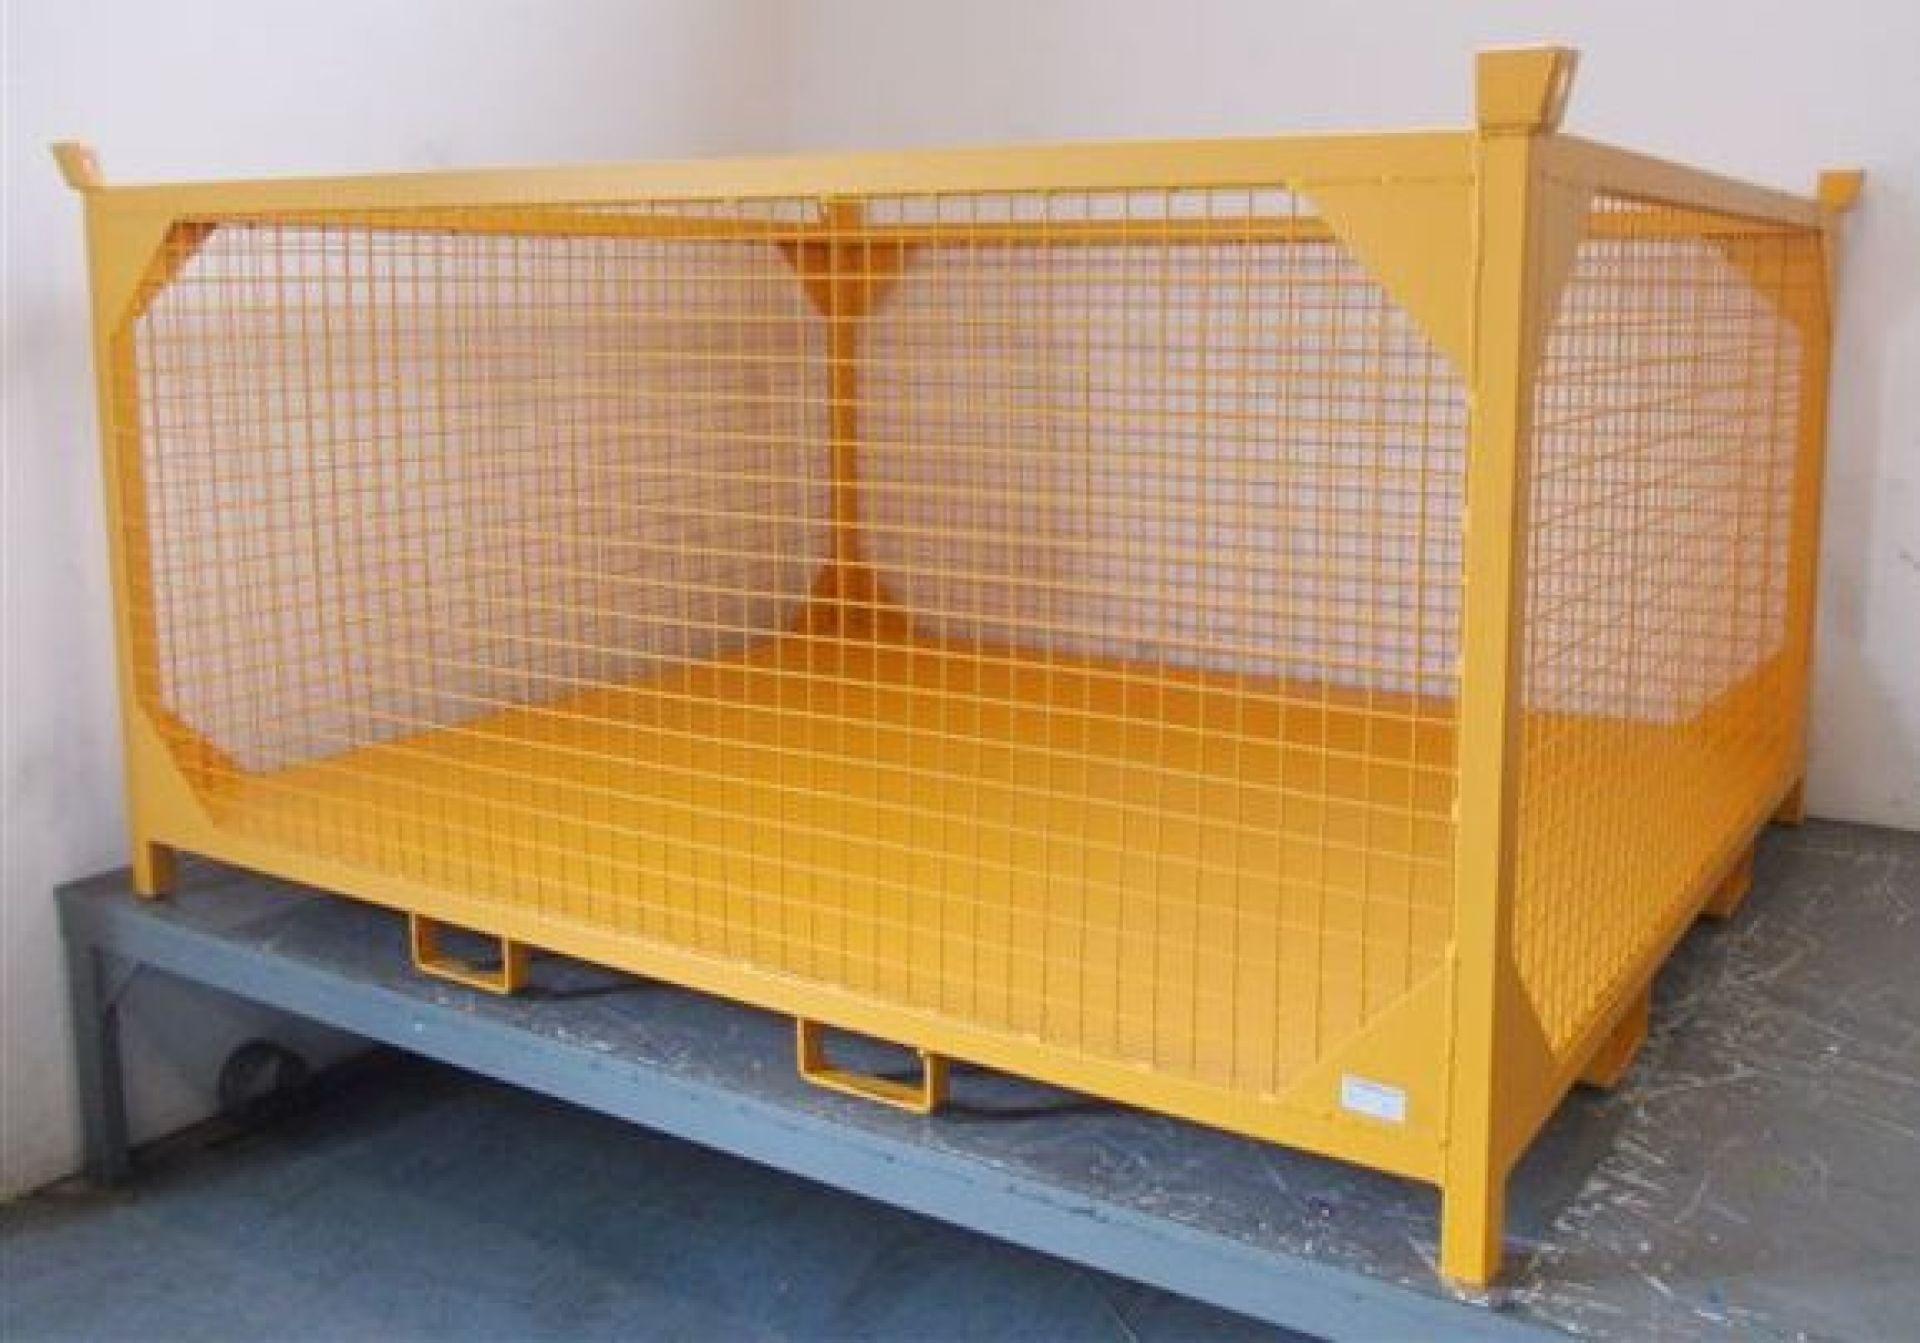 Gitterbehälter kranbar für Baustelle